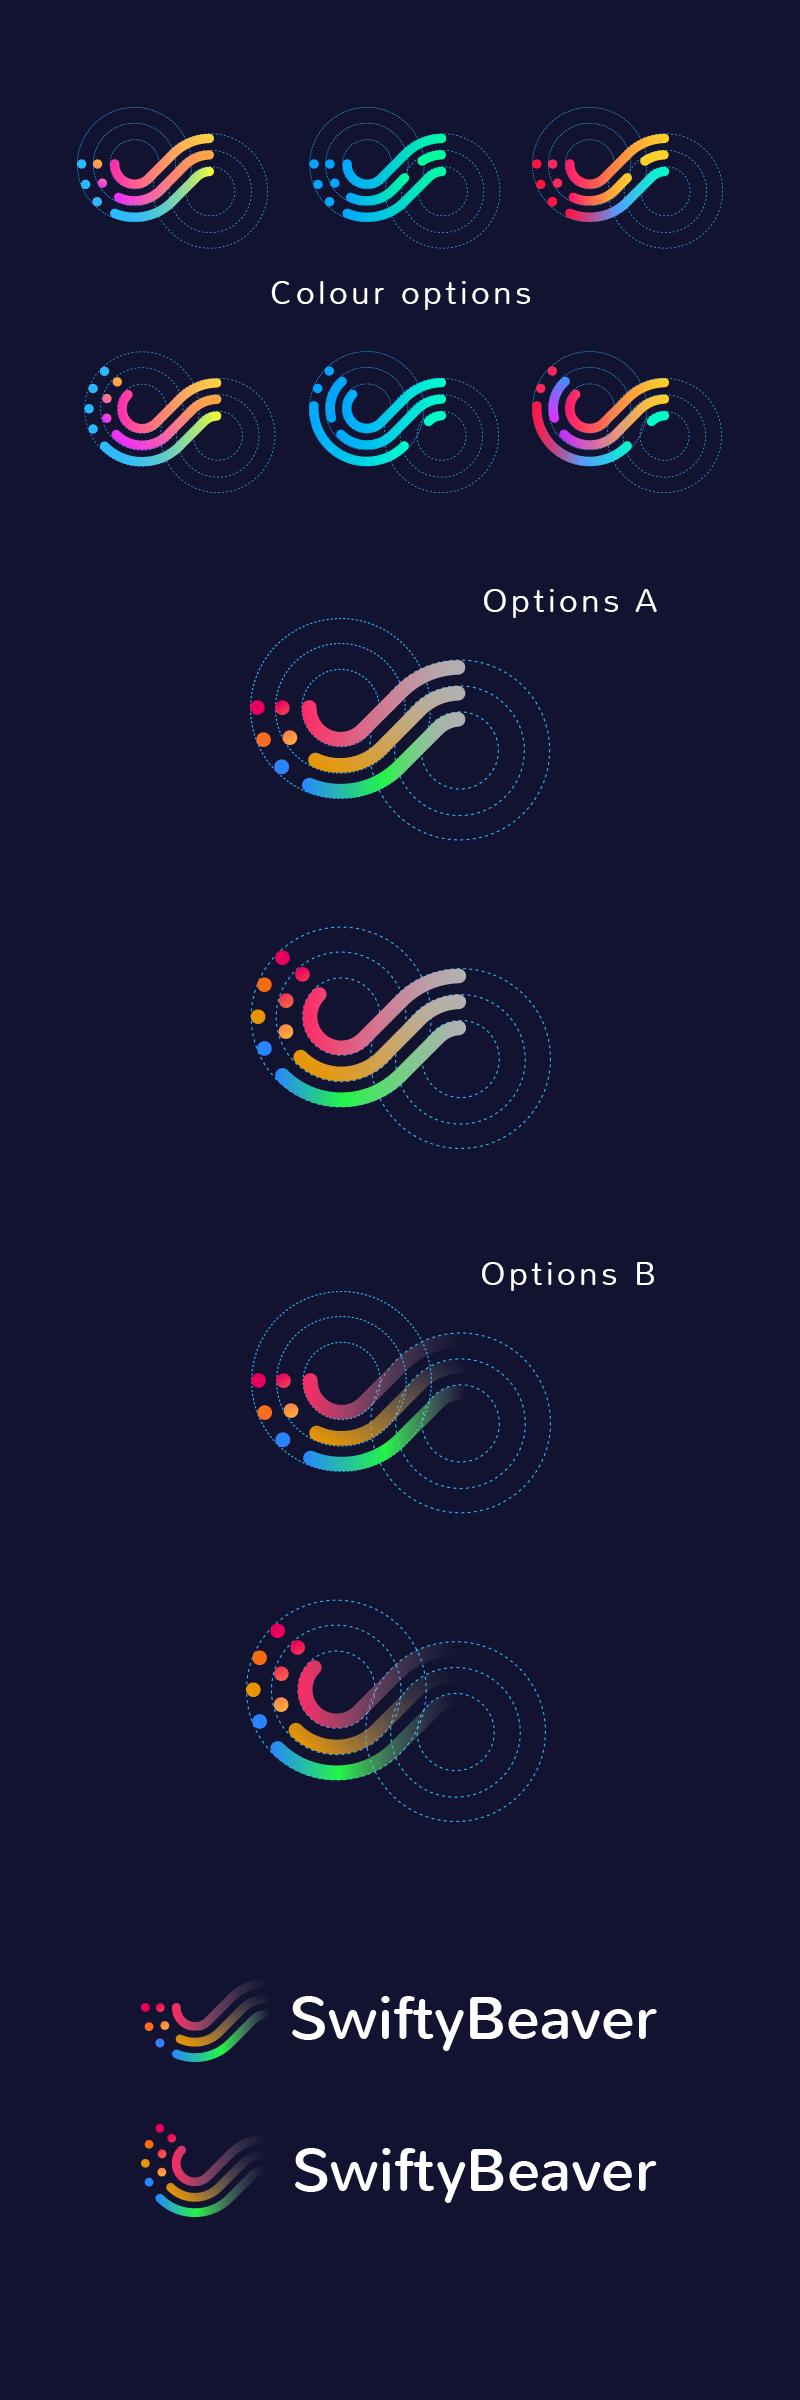 swiftybeaver logo design by-tubik-studio-1